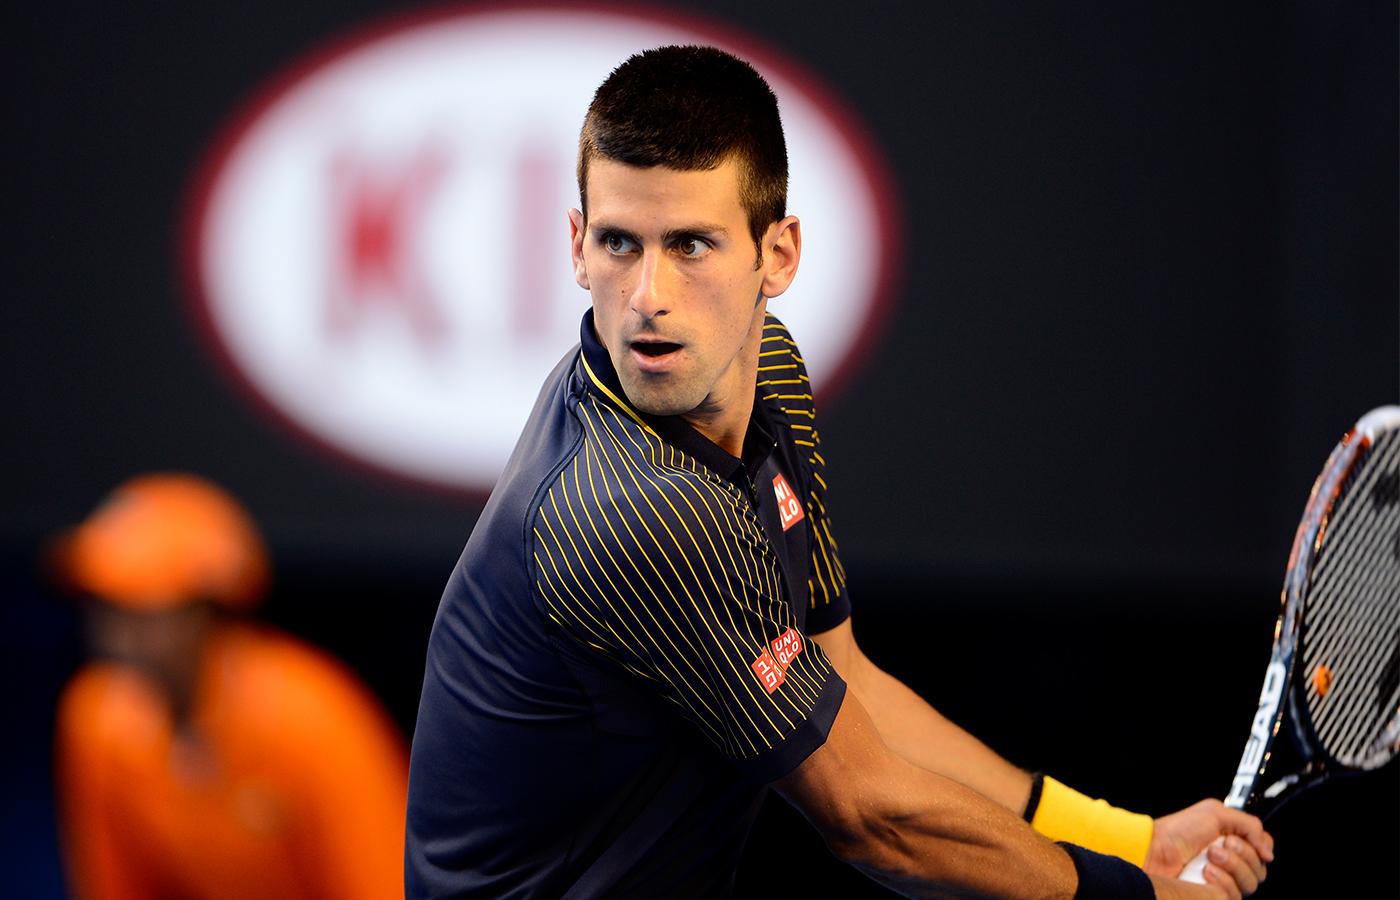 Djokovic venció a Ferrer en la semifinal del Abierto de Australia